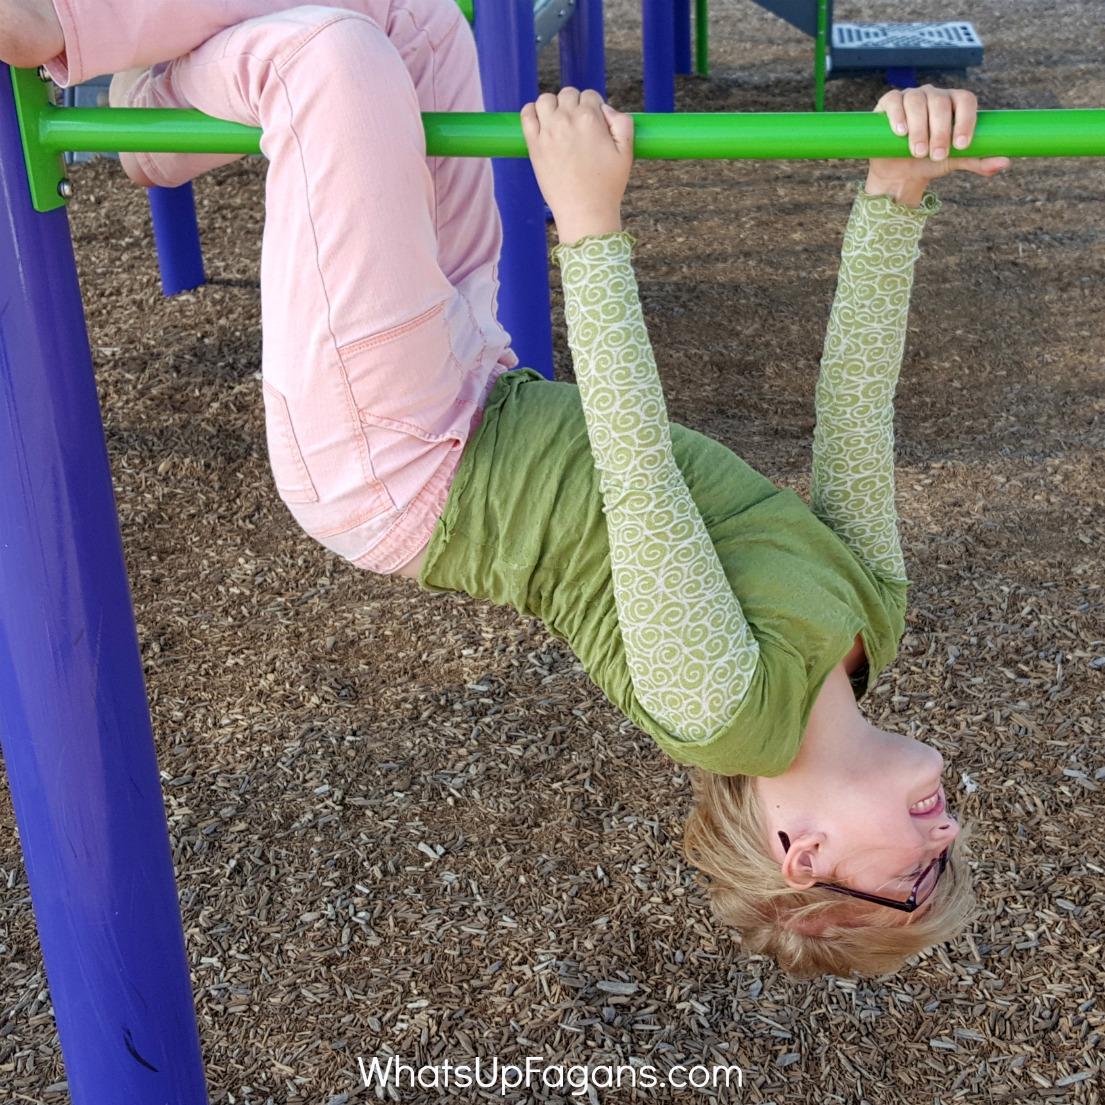 playing on playground - my kid has guts